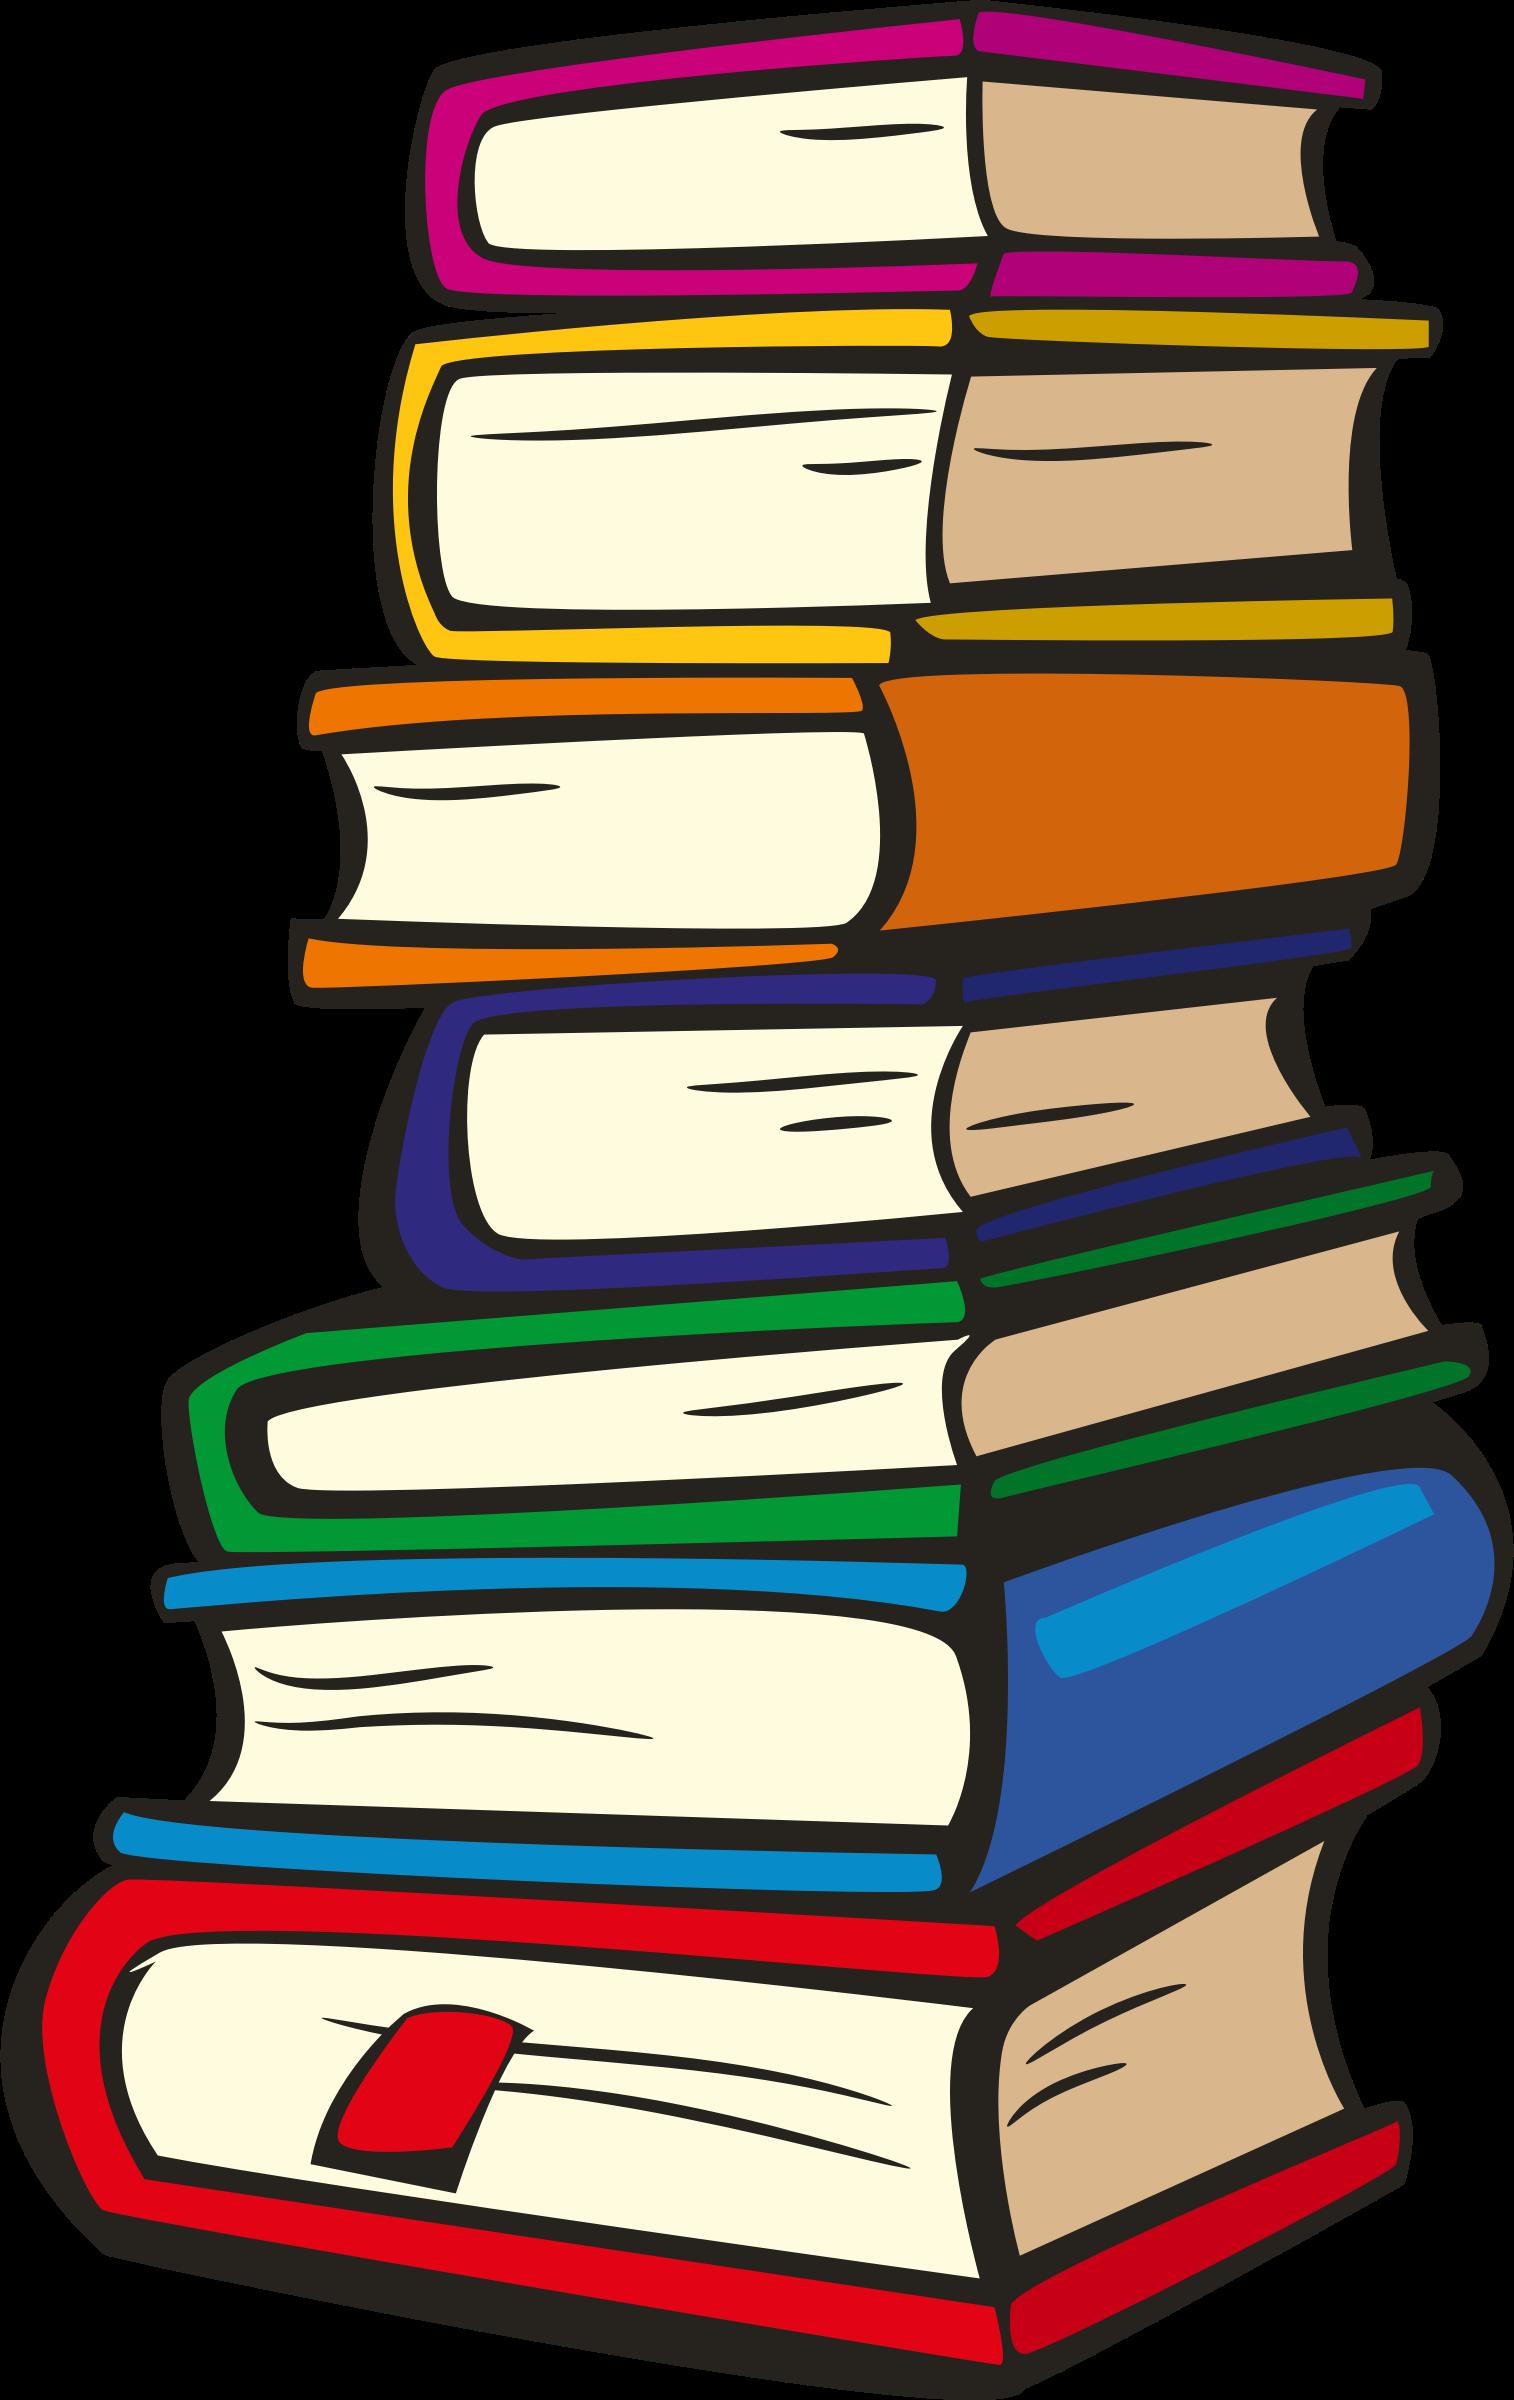 Textbook clipart book.